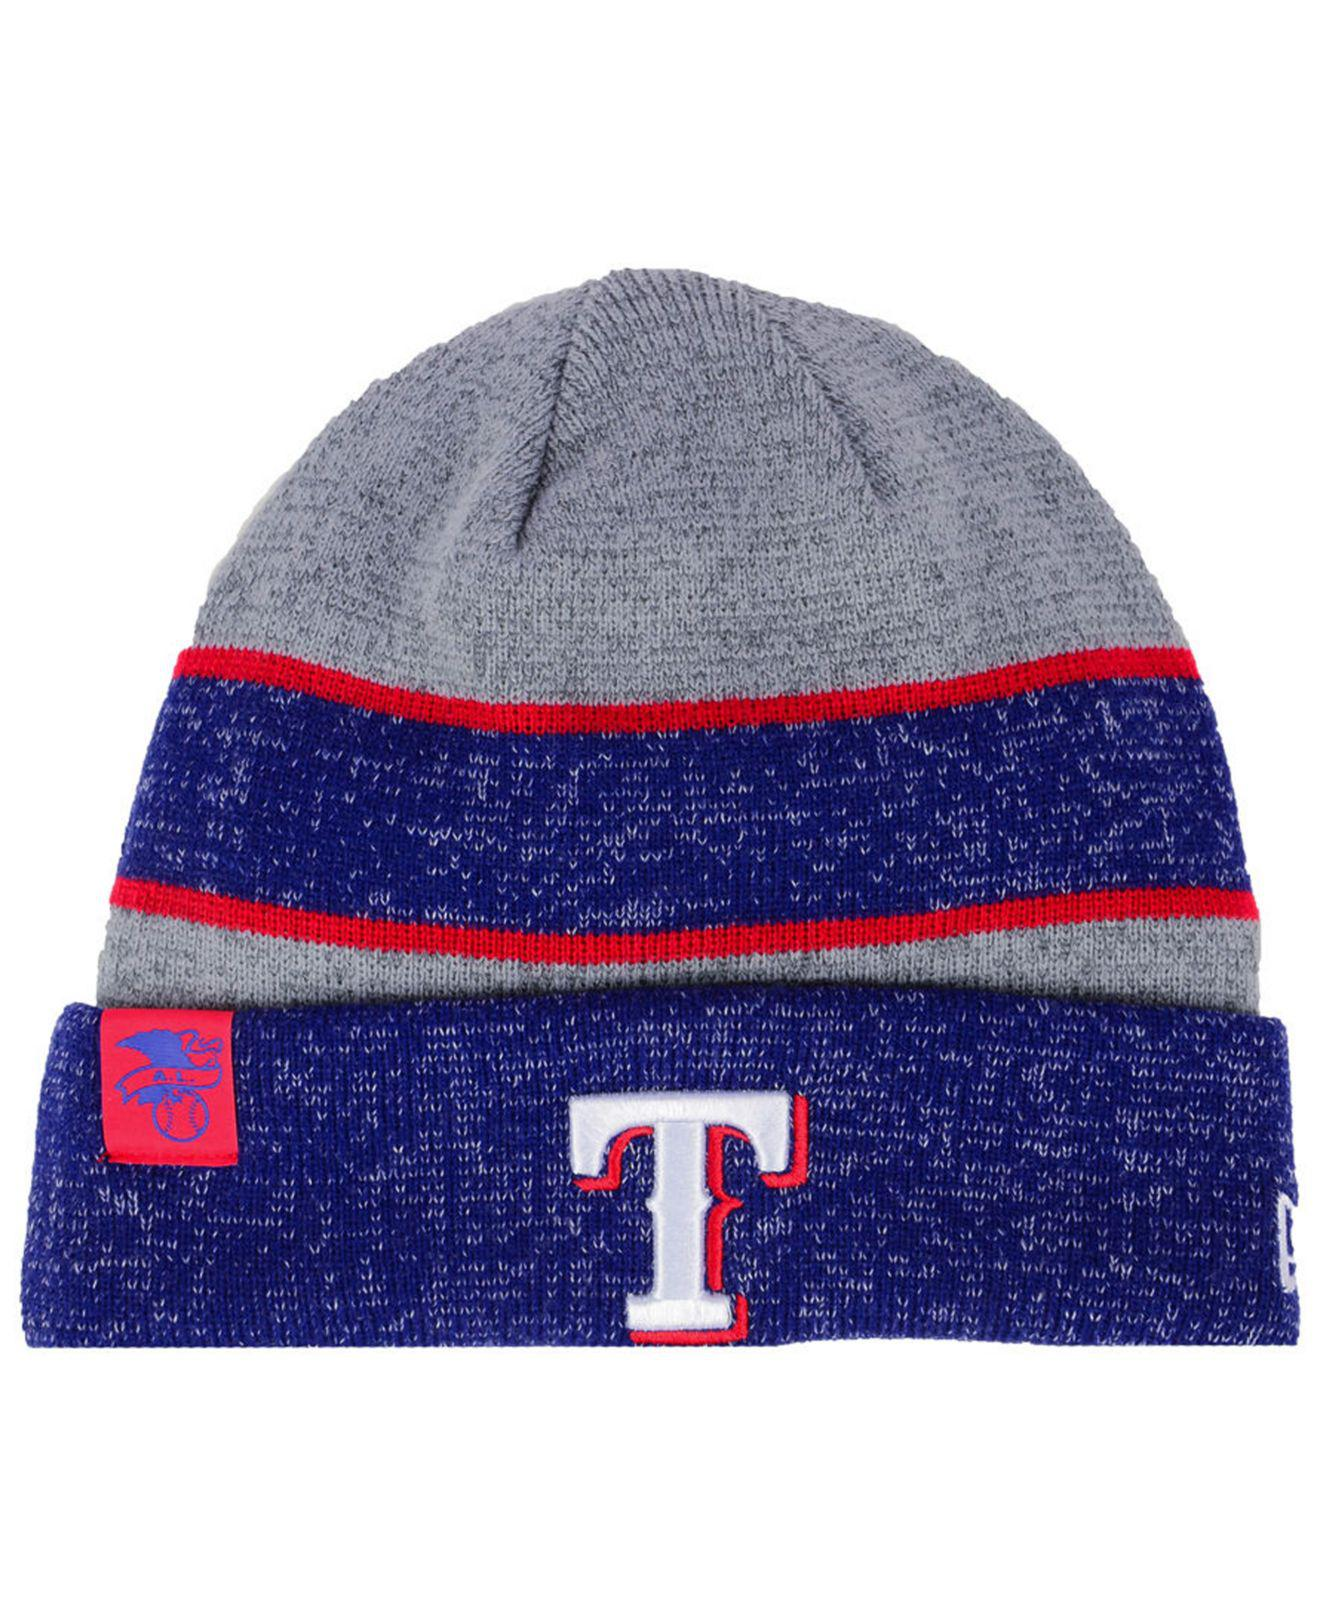 half off c3425 6aa13 germany texas rangers knit pom beanie with cuff hat cap e2e97 58b63  usa  ktz. mens texas rangers on field sport knit hat 91d99 916bb